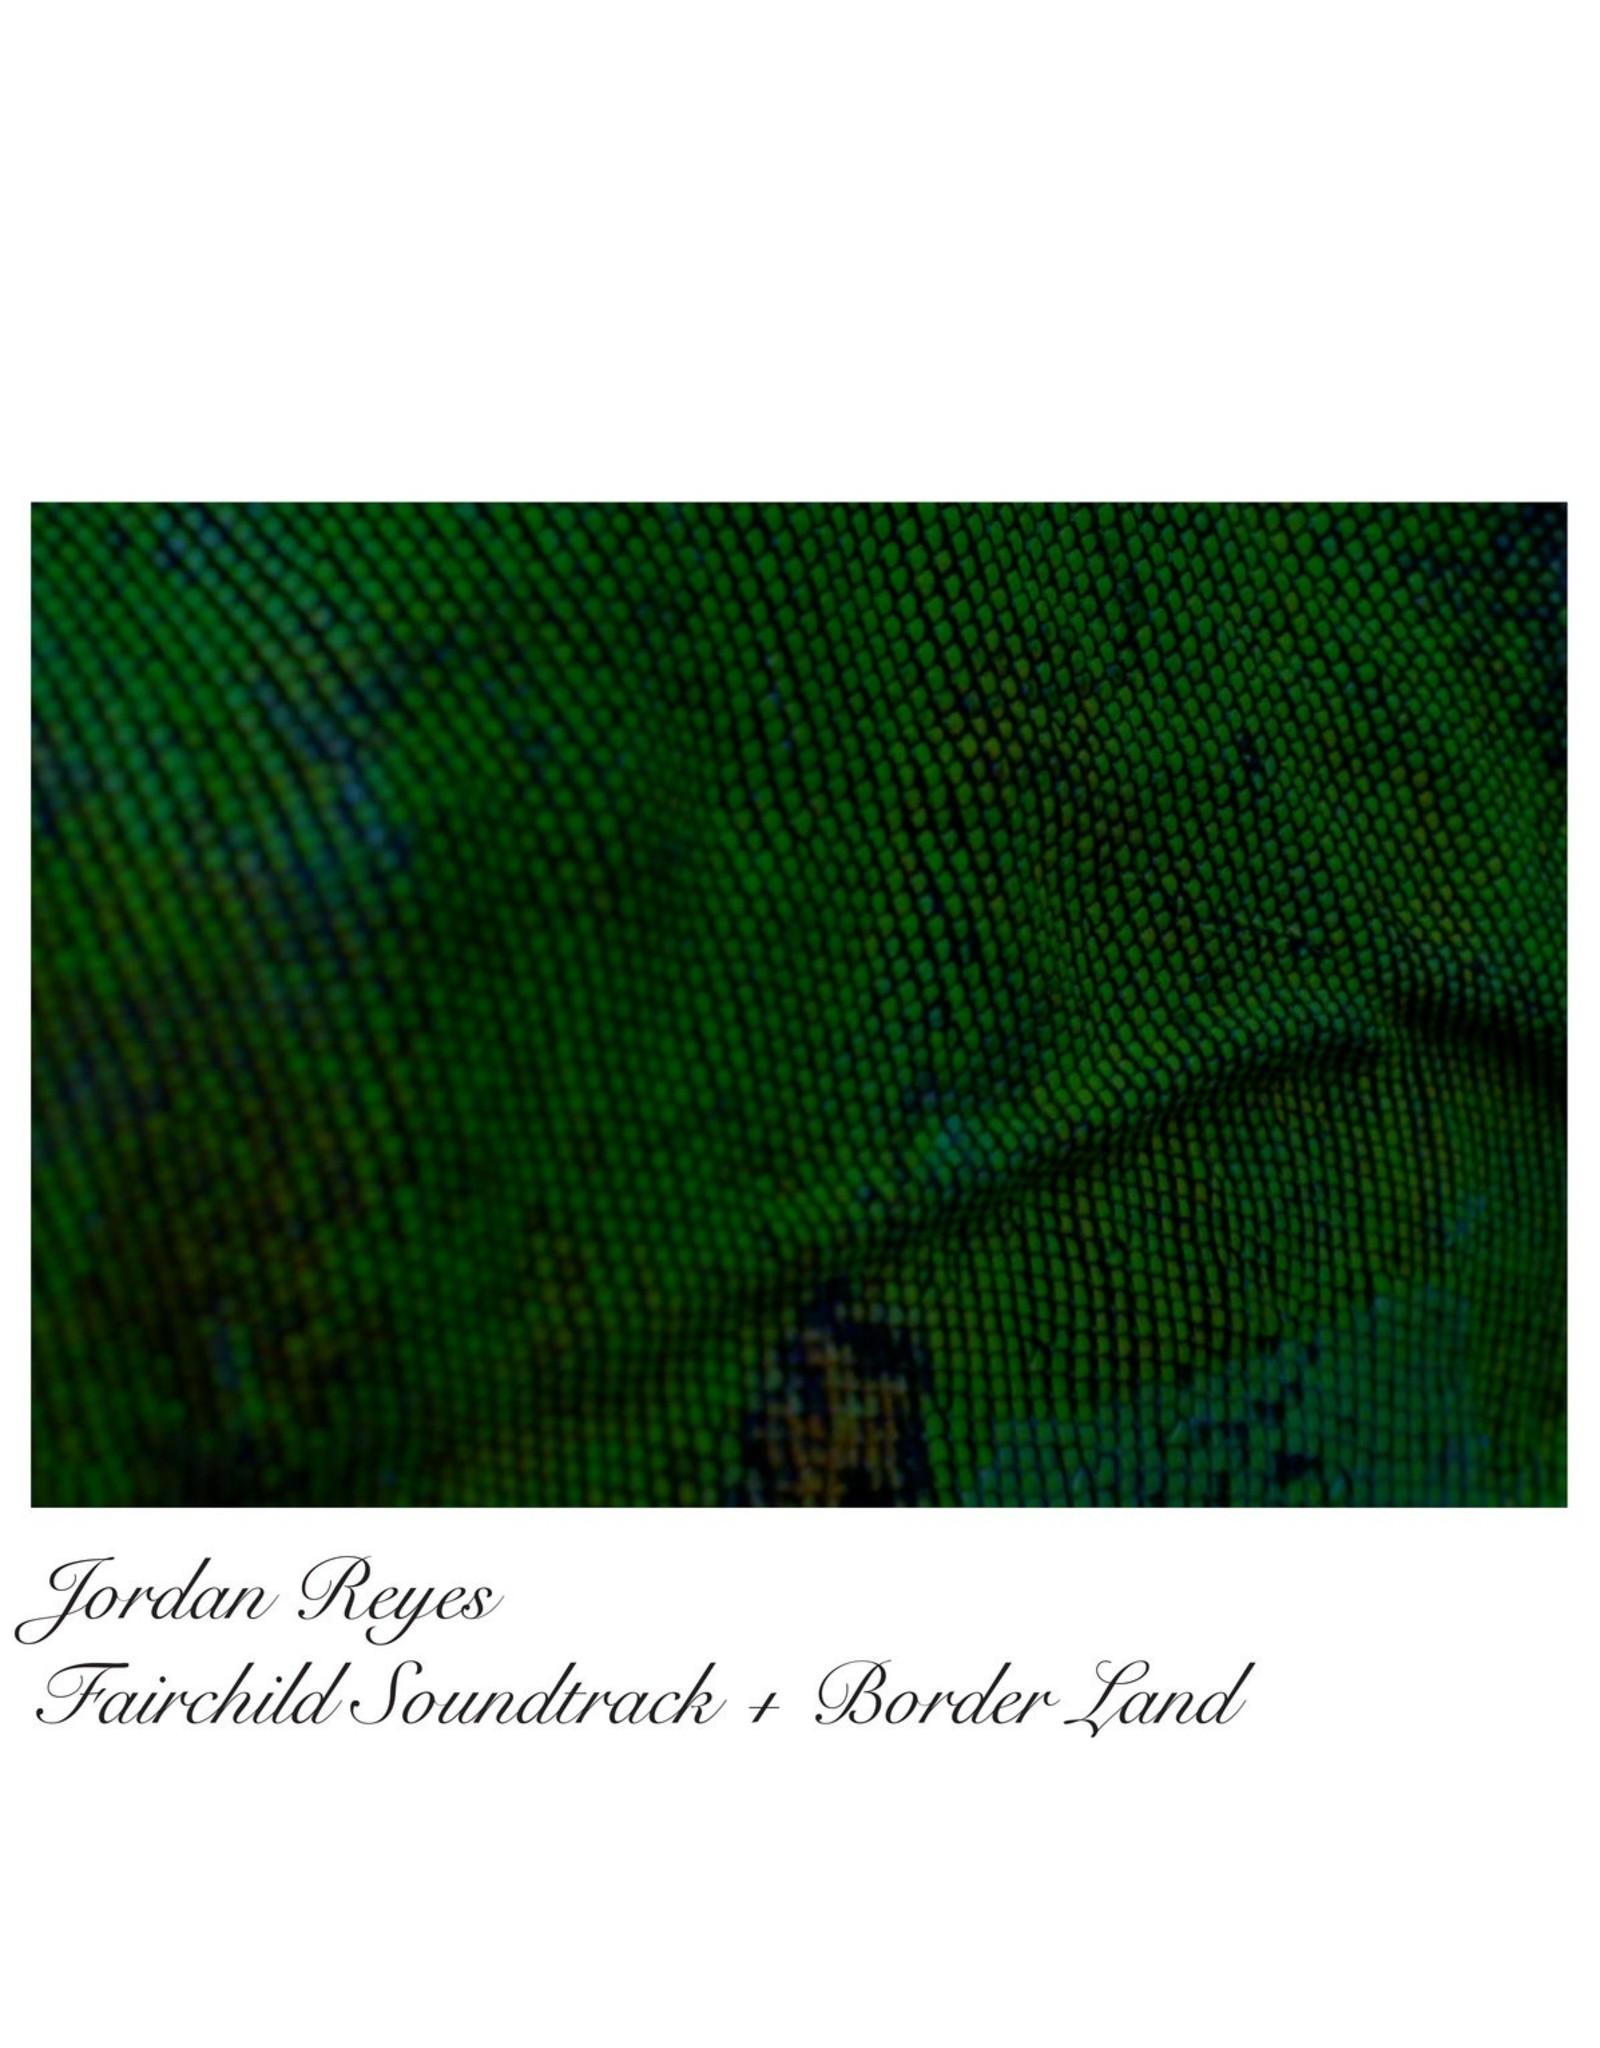 New Vinyl Jordan Reyes - Fairchild Soundtrack + Border Land LP